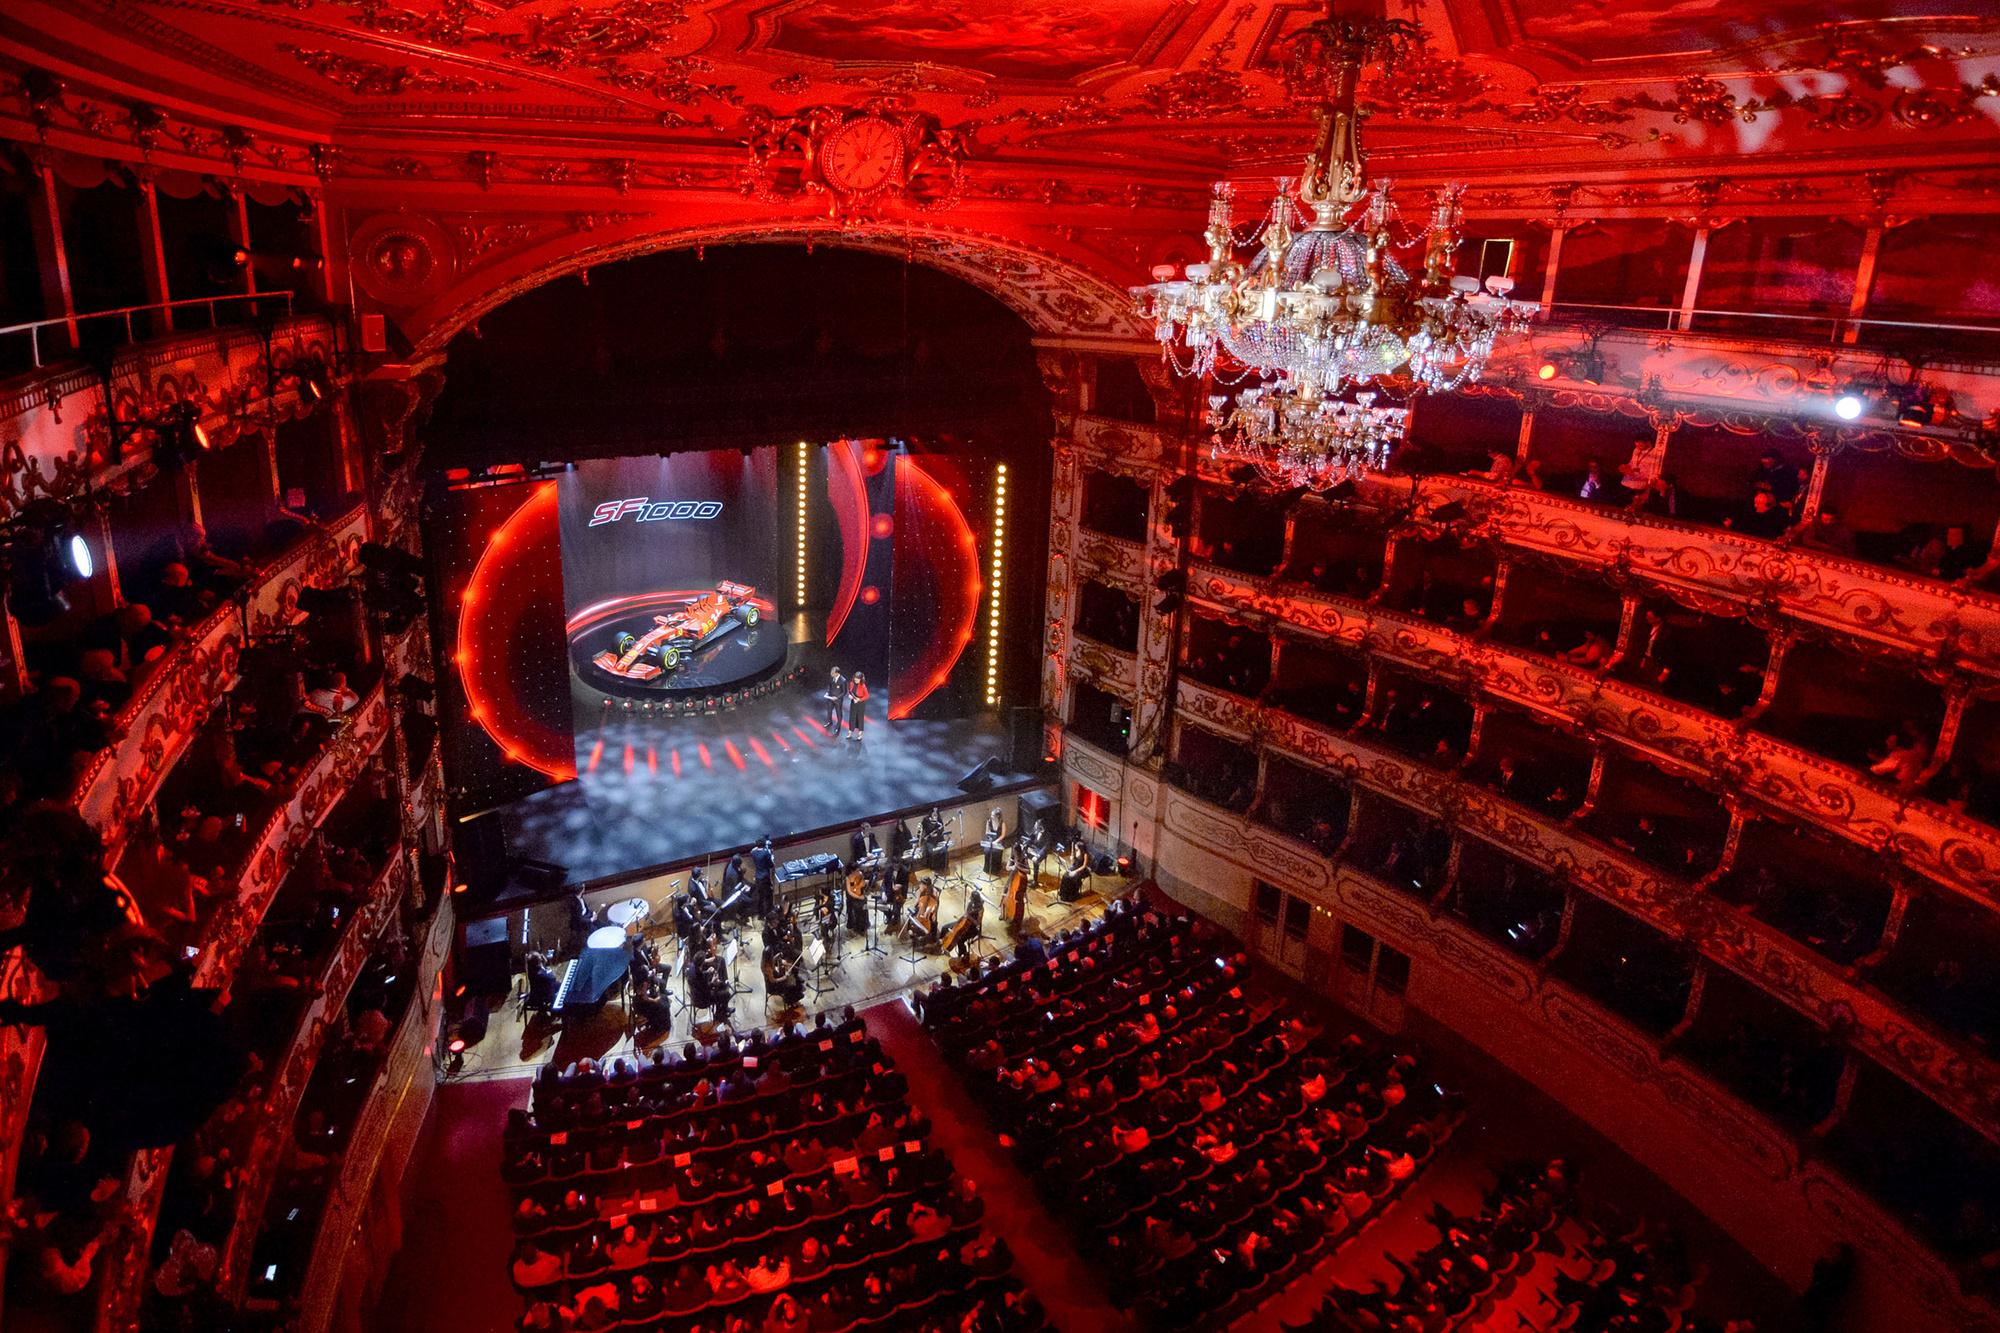 De nieuwe ferrari werd voorgesteld in het Teatro Romolo-Valli in Reggio Emilia., Belga Image